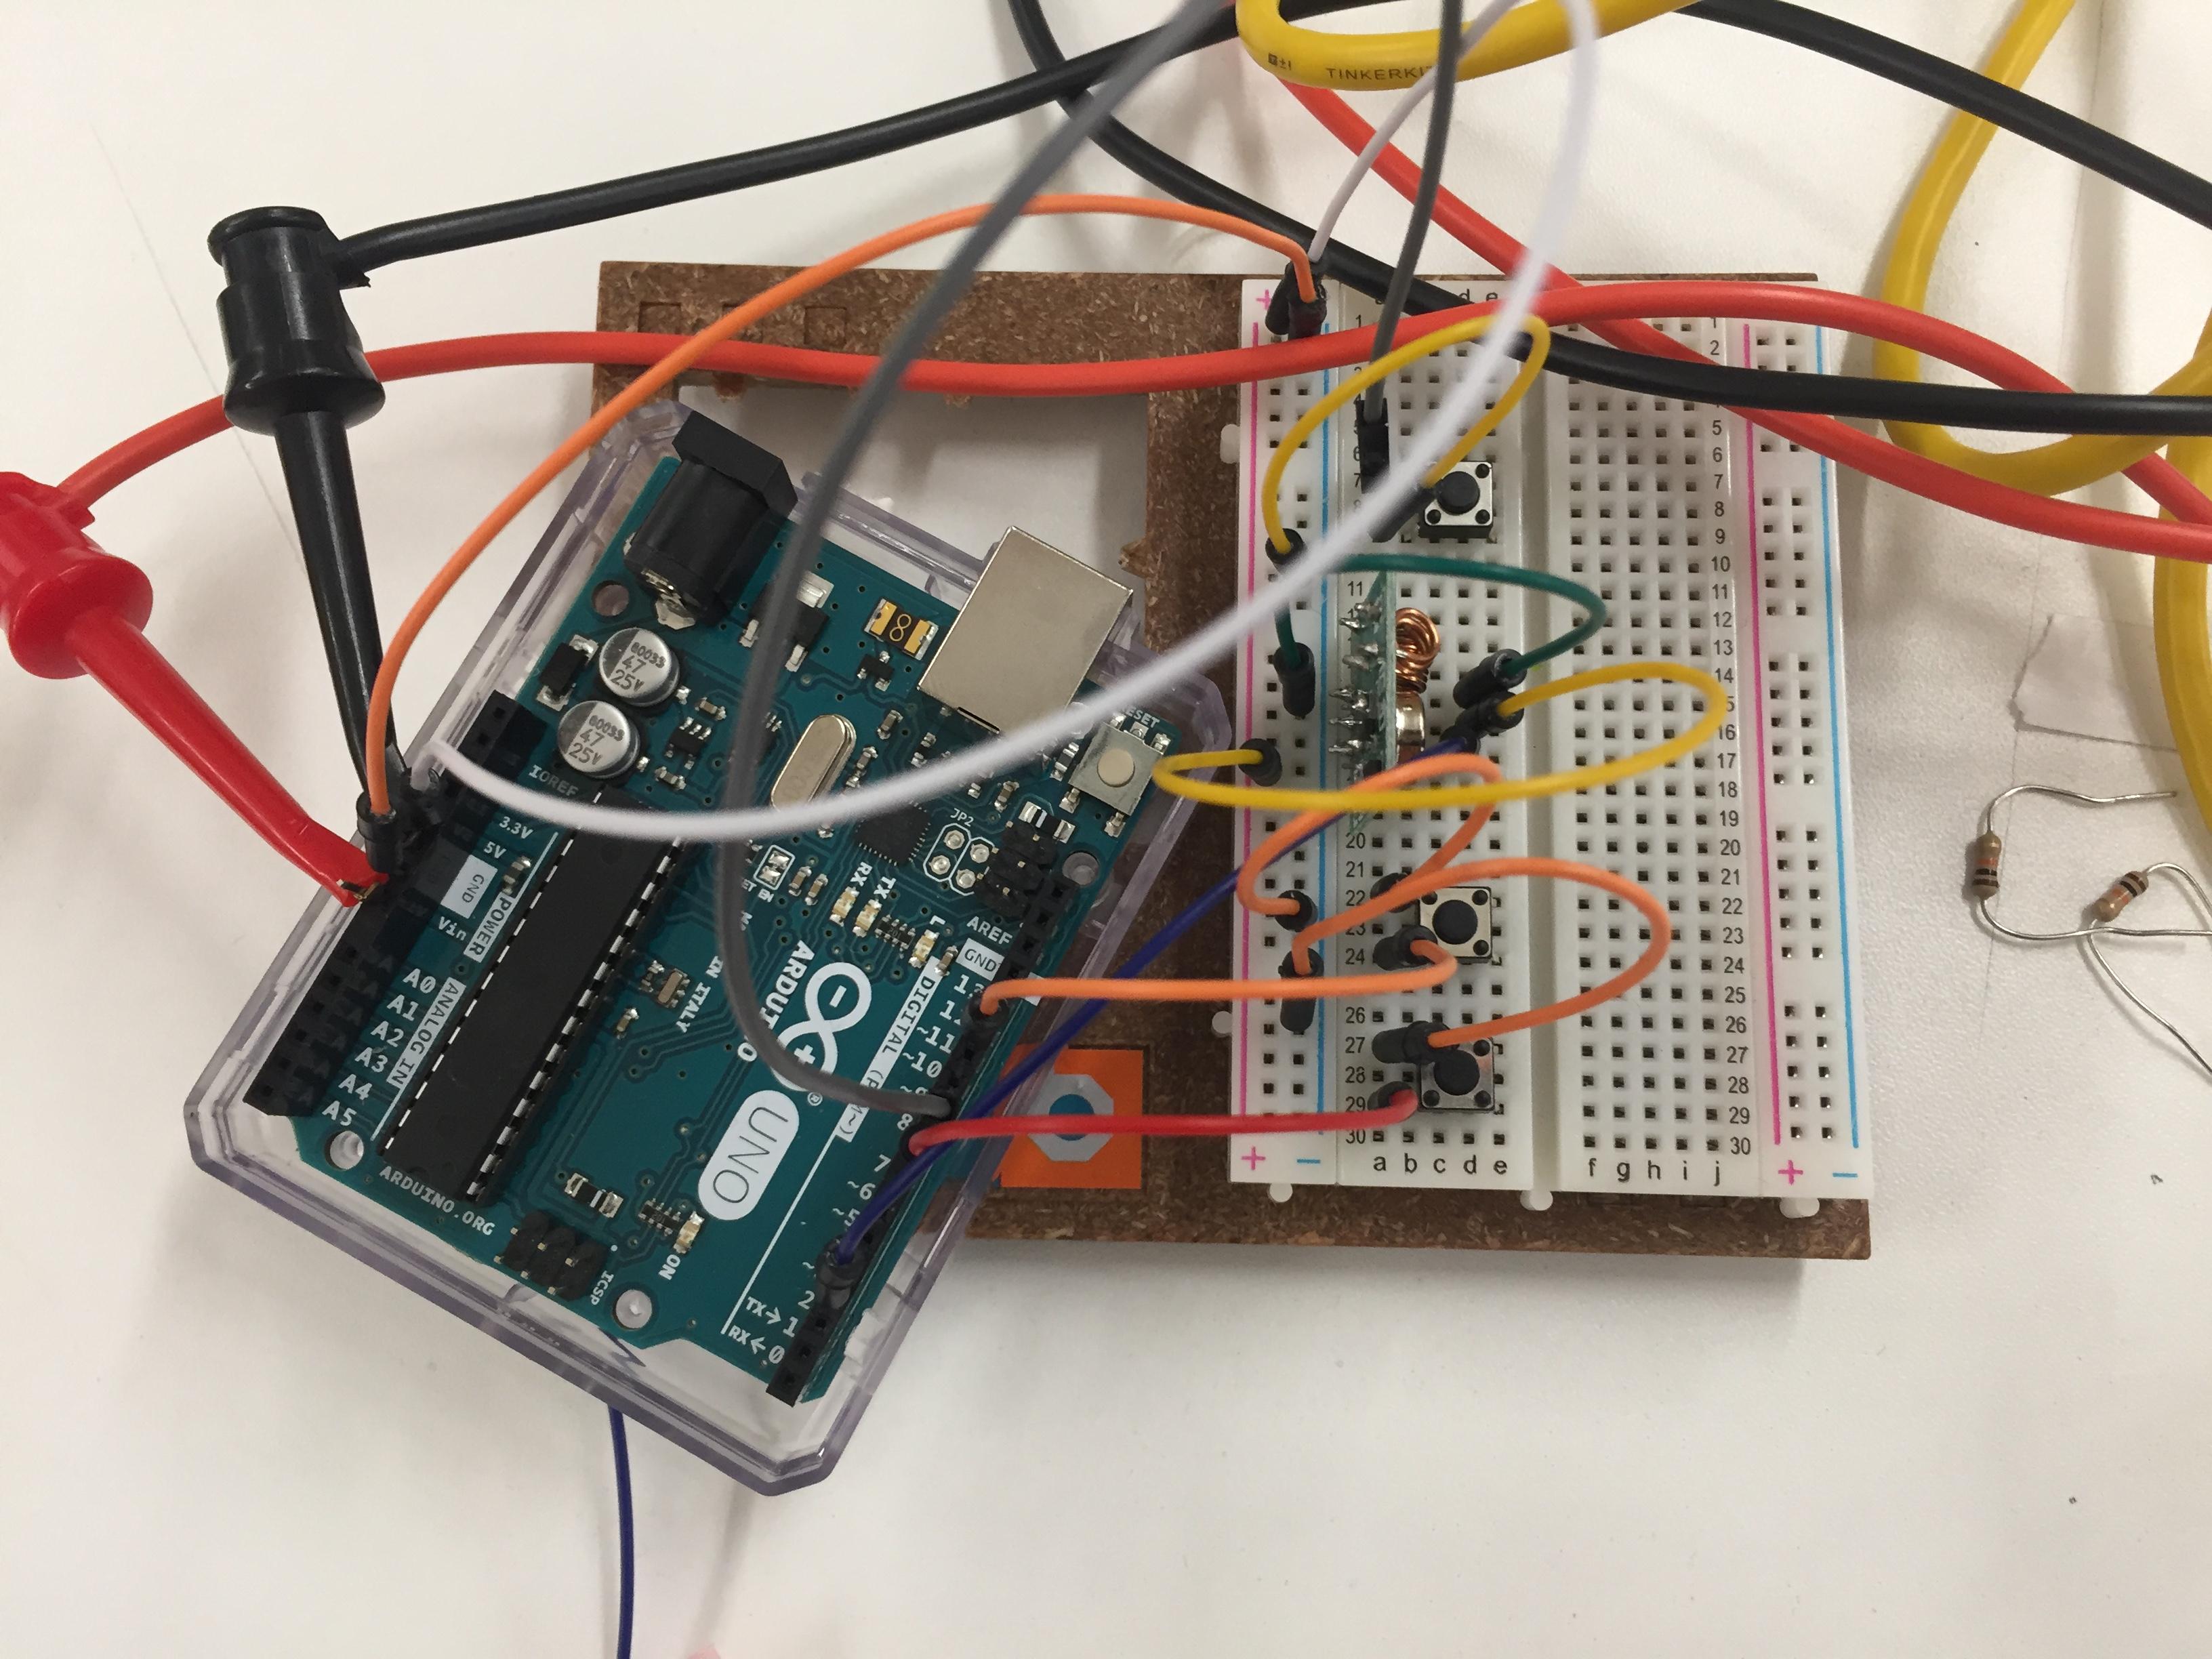 Ma In Computational Arts Blog Balancing Robots Simple Wireless Circuit Radio Control Http Instructablescom Id Make A Rf Robot Using Arduino